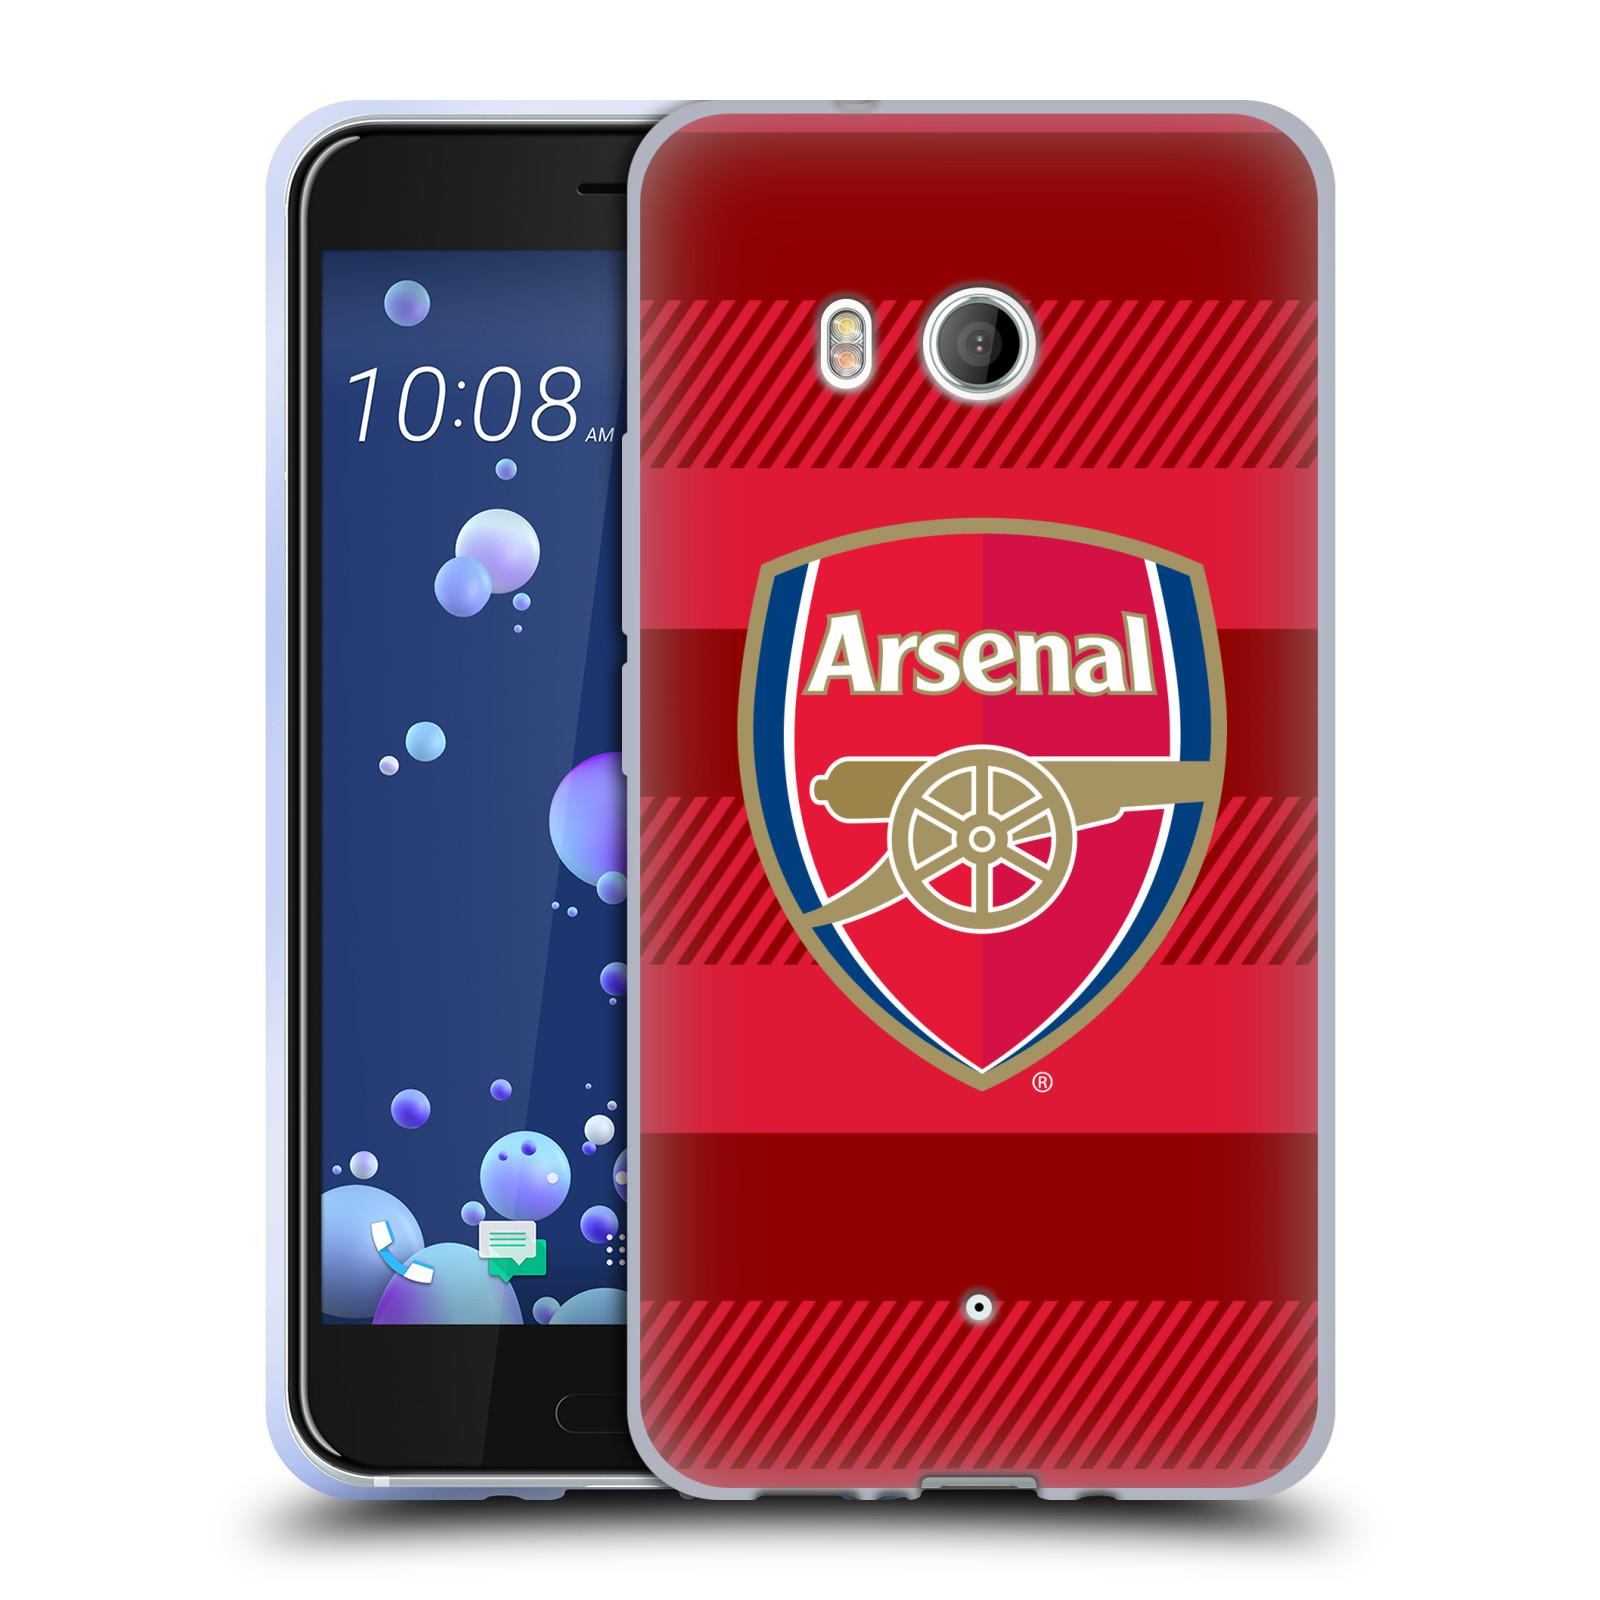 Silikonové pouzdro na mobil HTC U11 - Head Case - Arsenal FC - Logo s pruhy